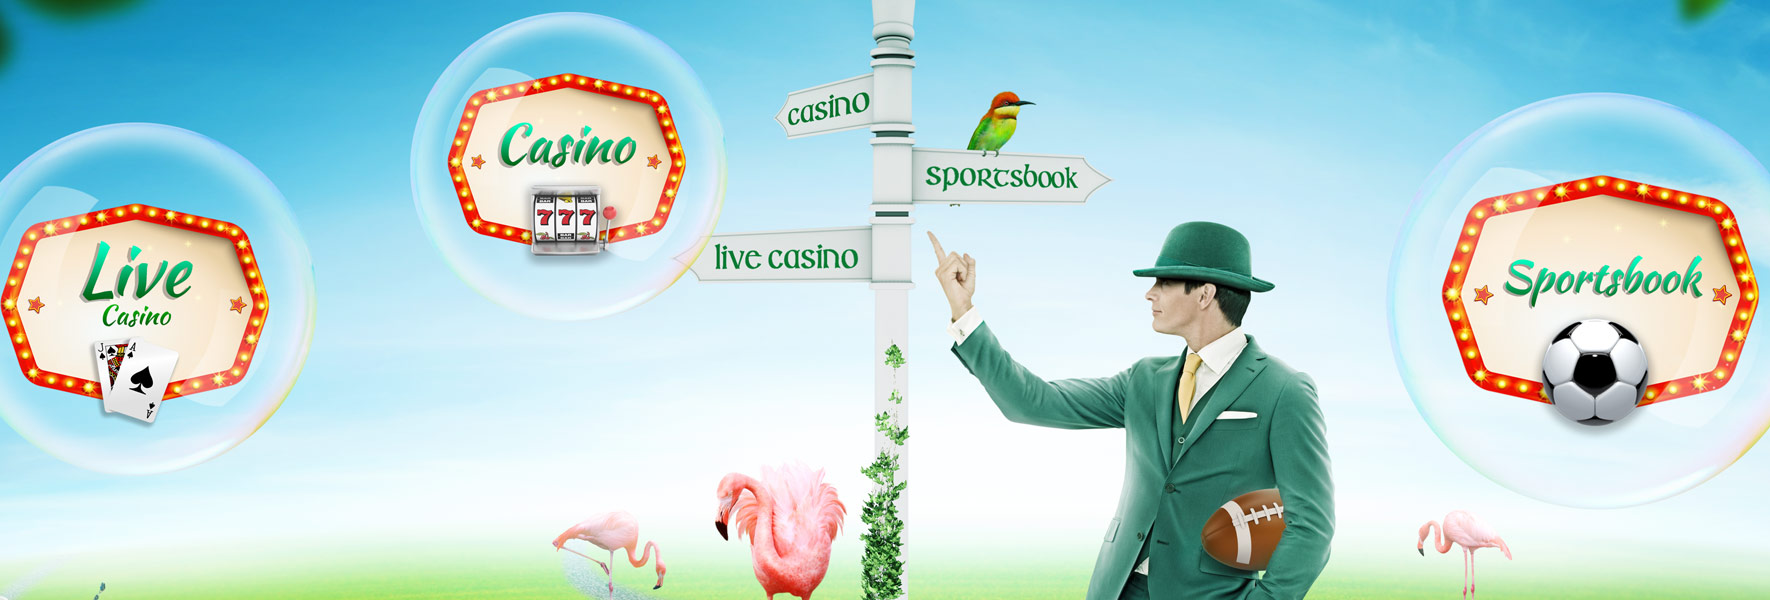 online casino gambling site sic bo